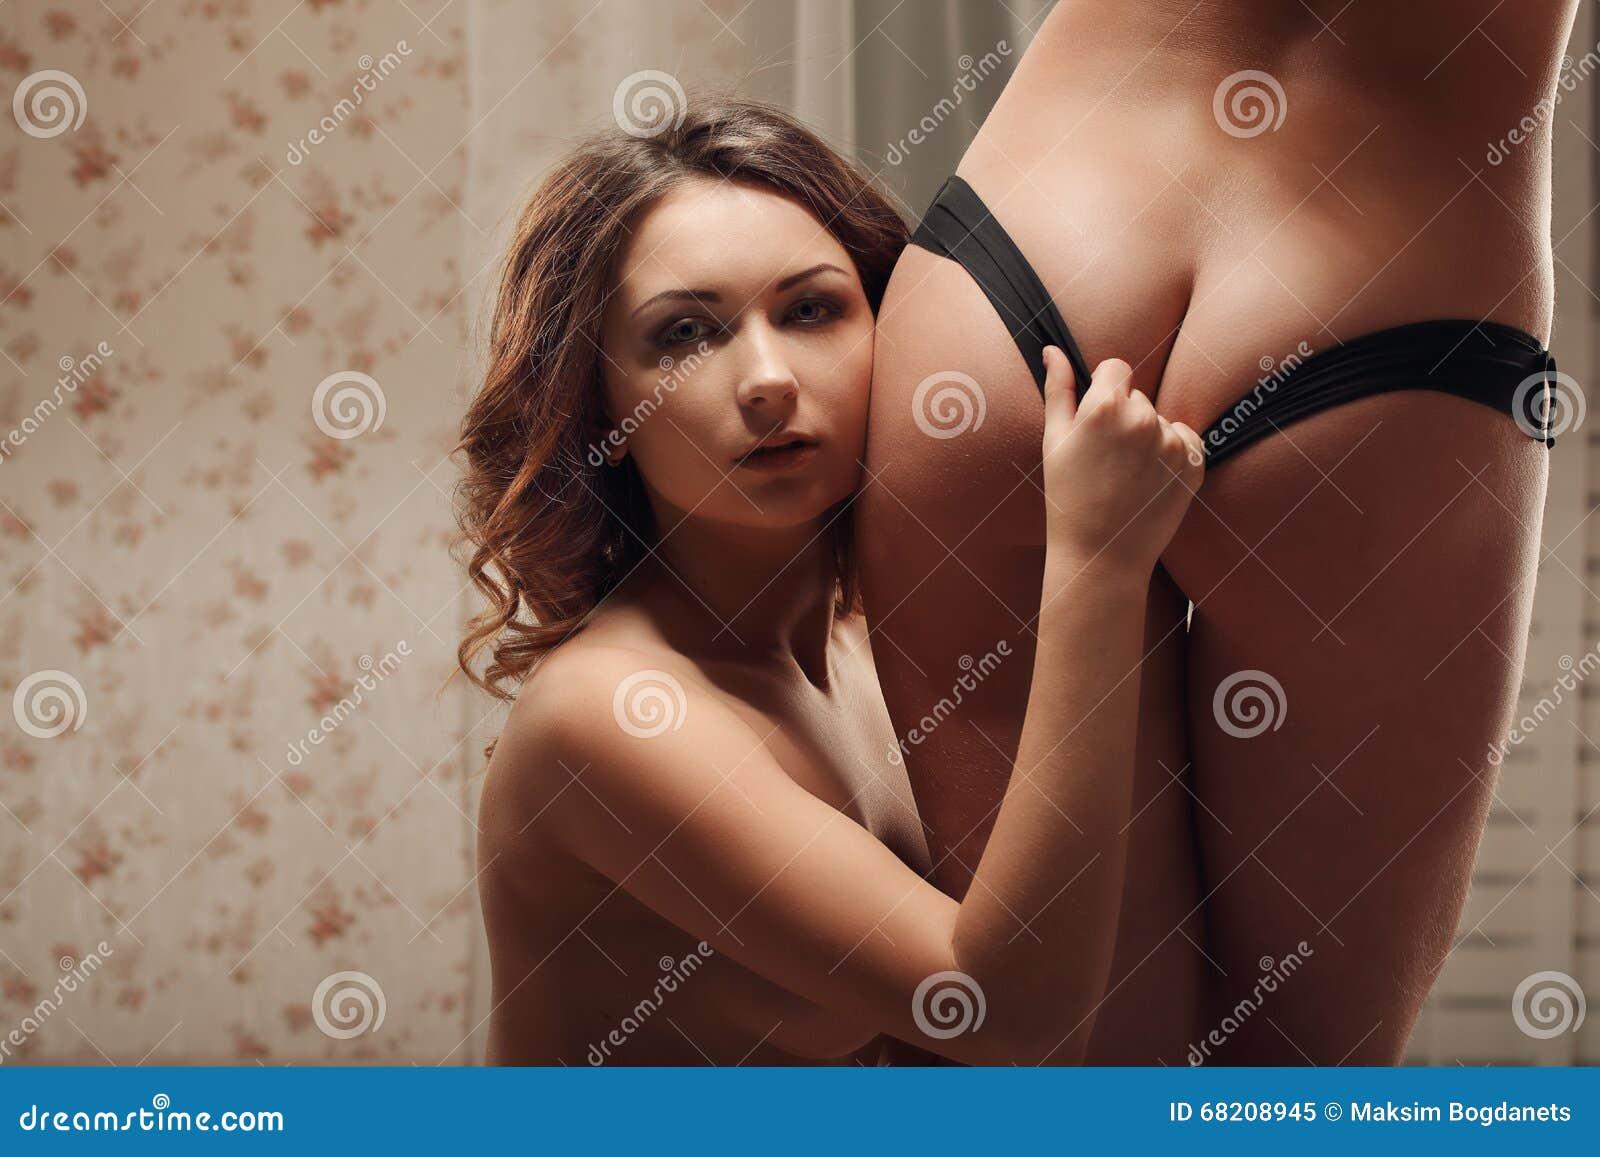 Tolle Sex-Röhre